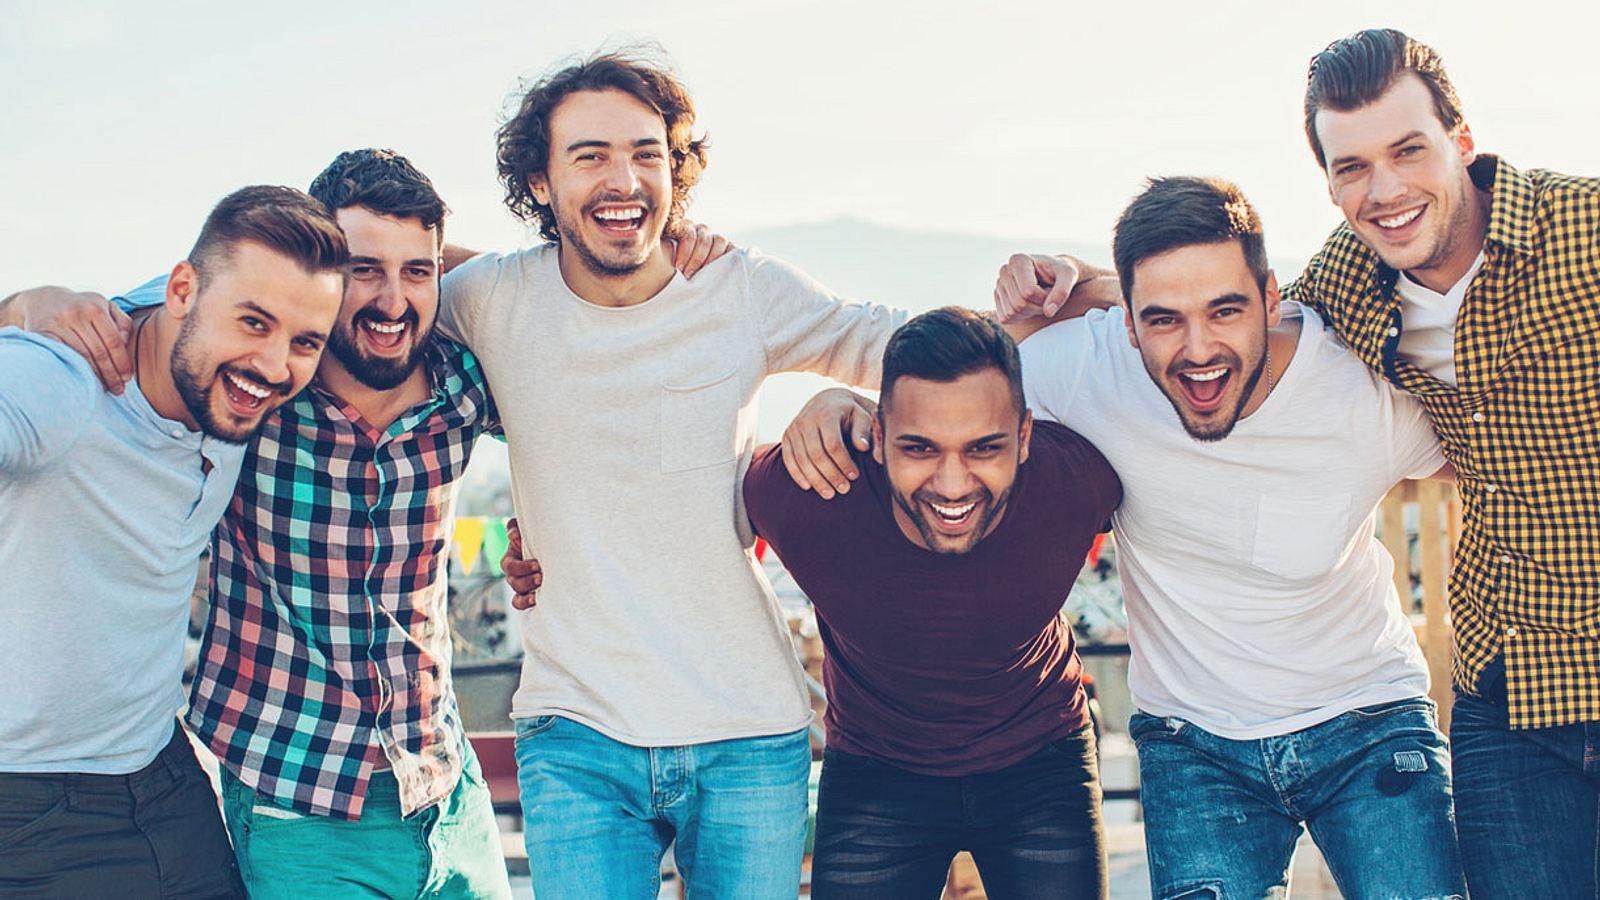 Junggesellenabschied in Berlin: 7 geniale Ideen für Männer